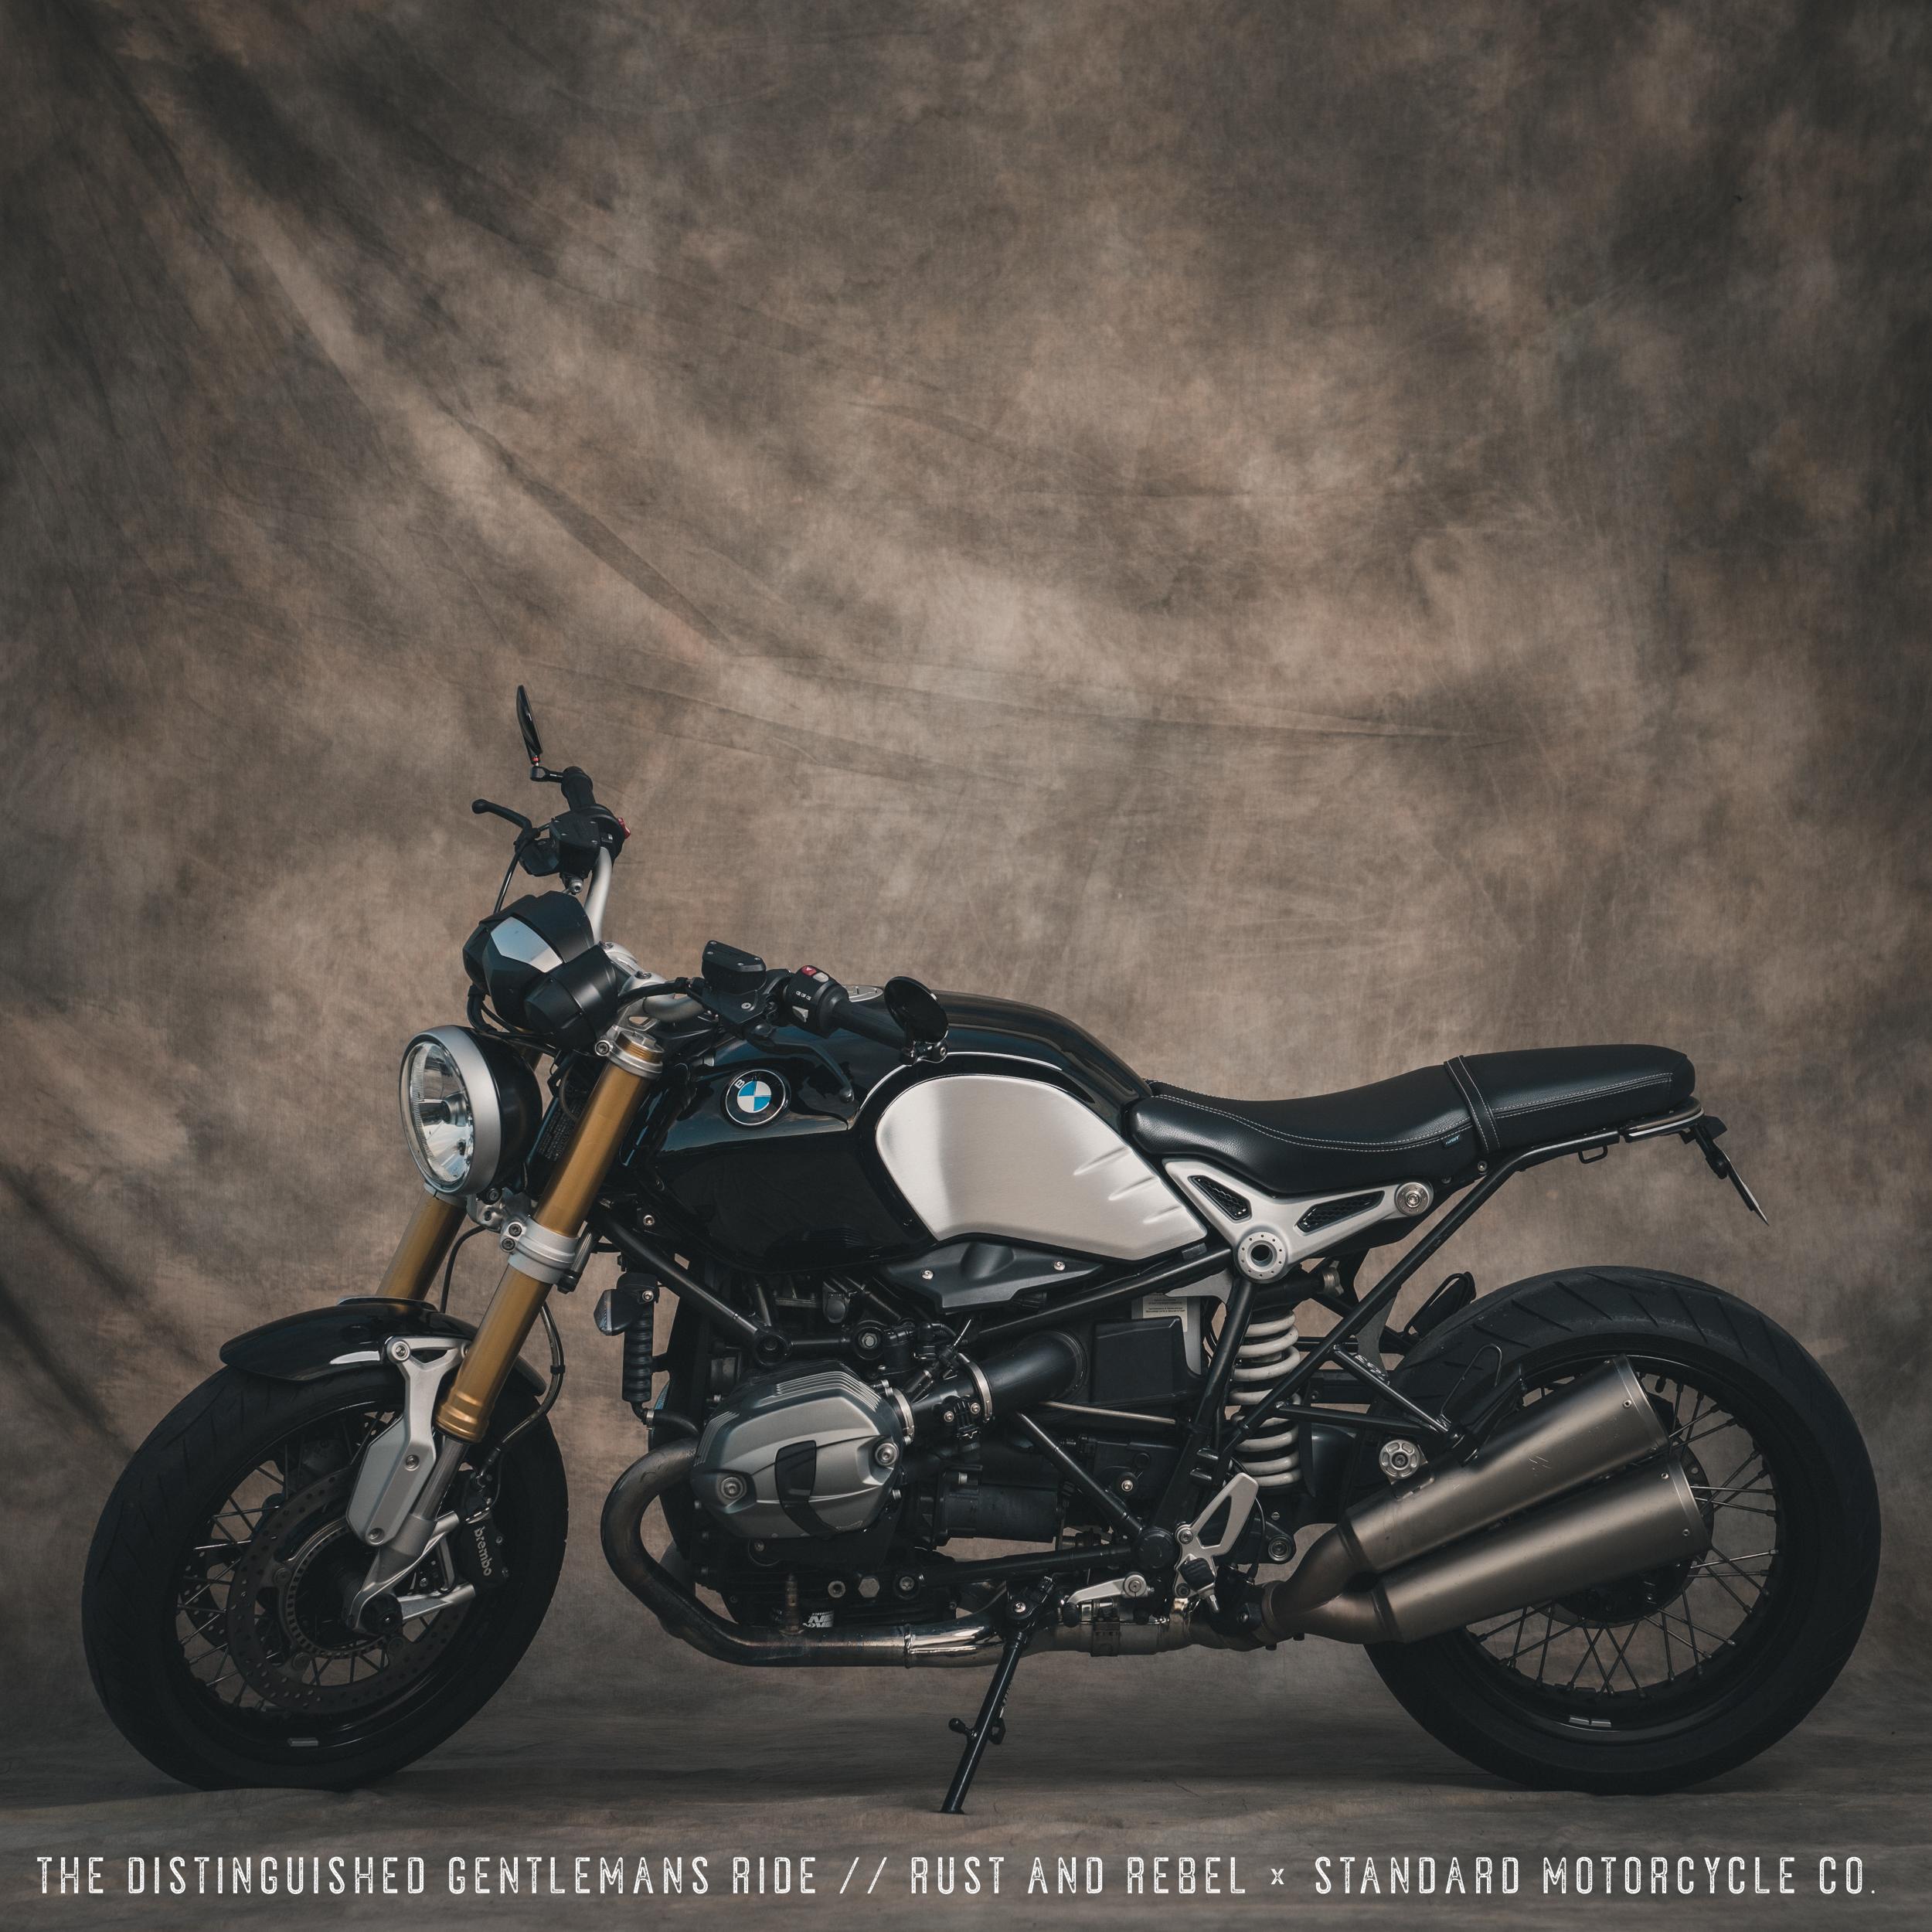 The Distinguished Gentleman's Ride 2019 [PEOPLE - PHOTO BY @MIKEDUNNUSA] - 0139.jpg